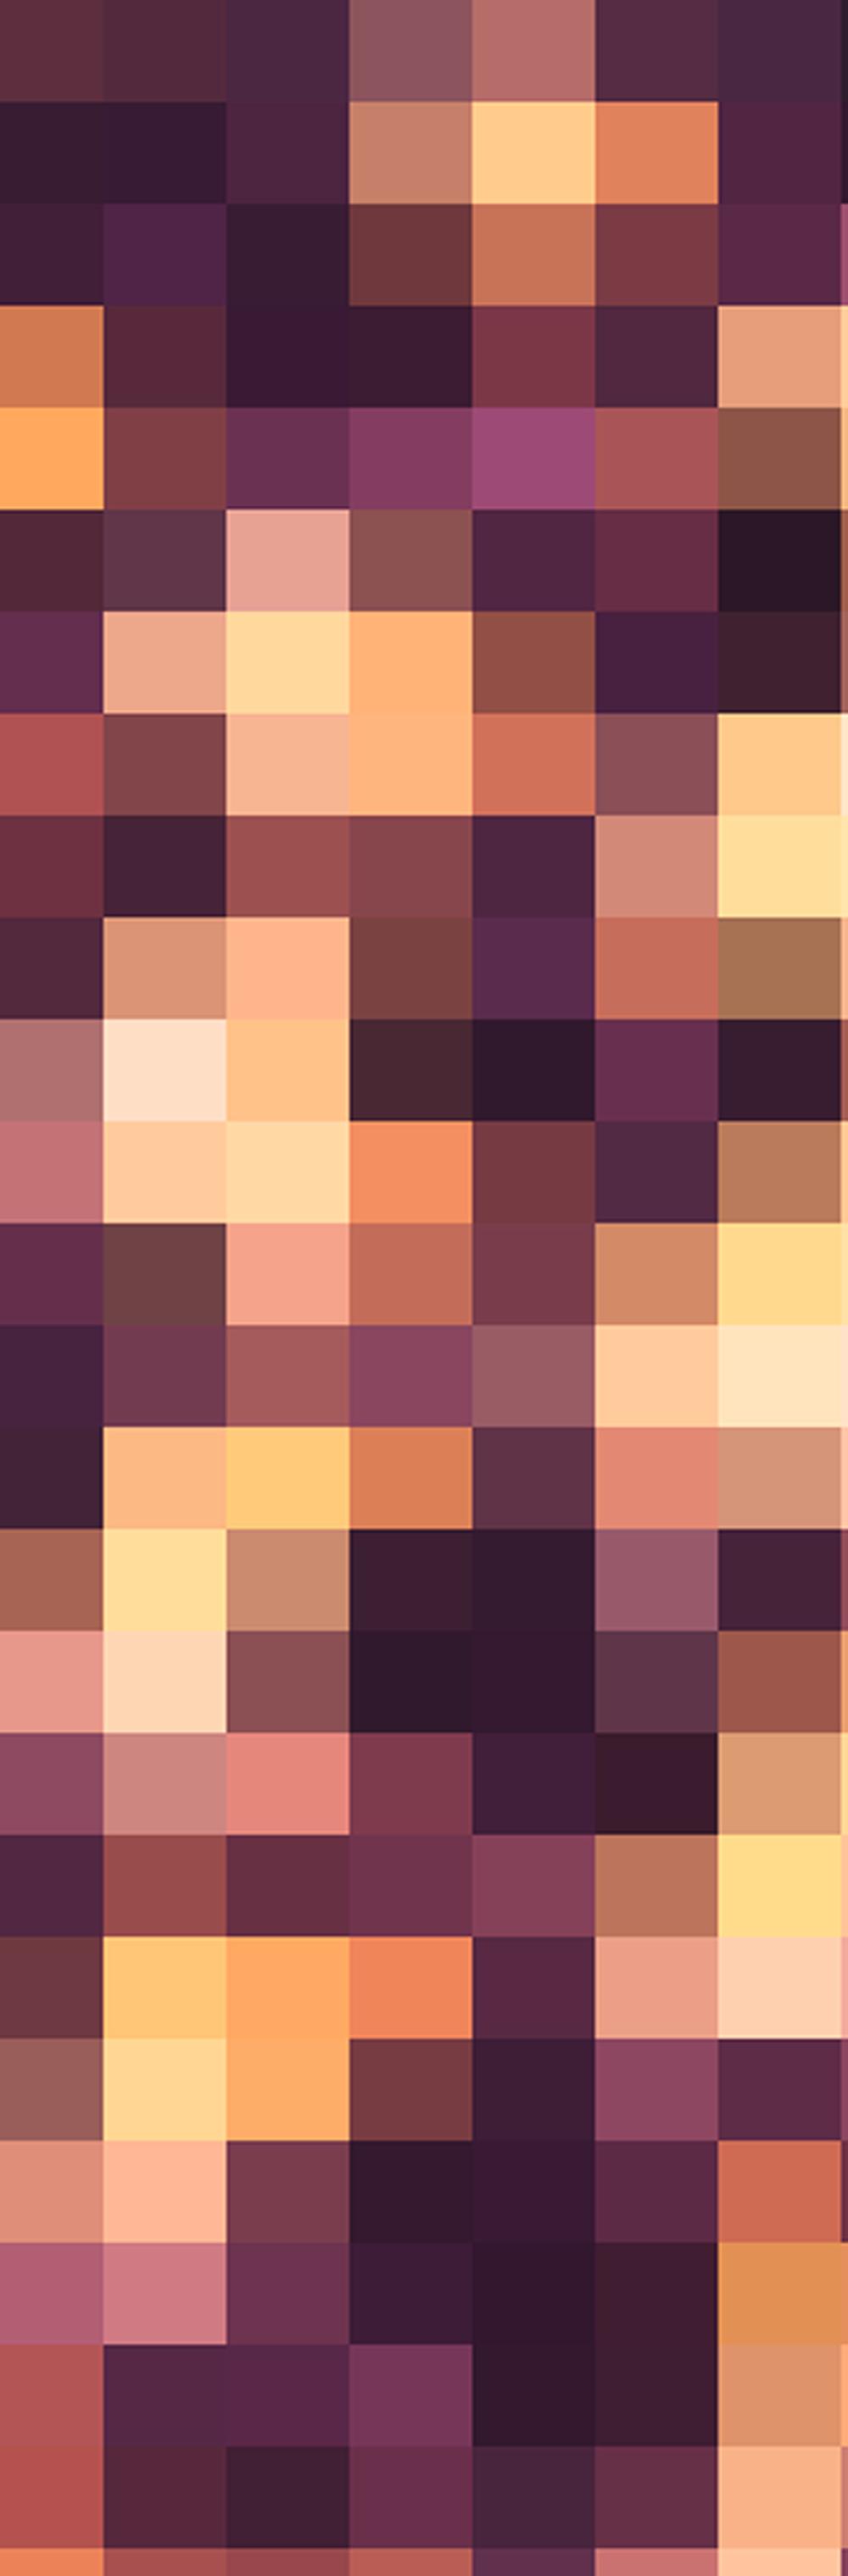 MB Pixel 3-120